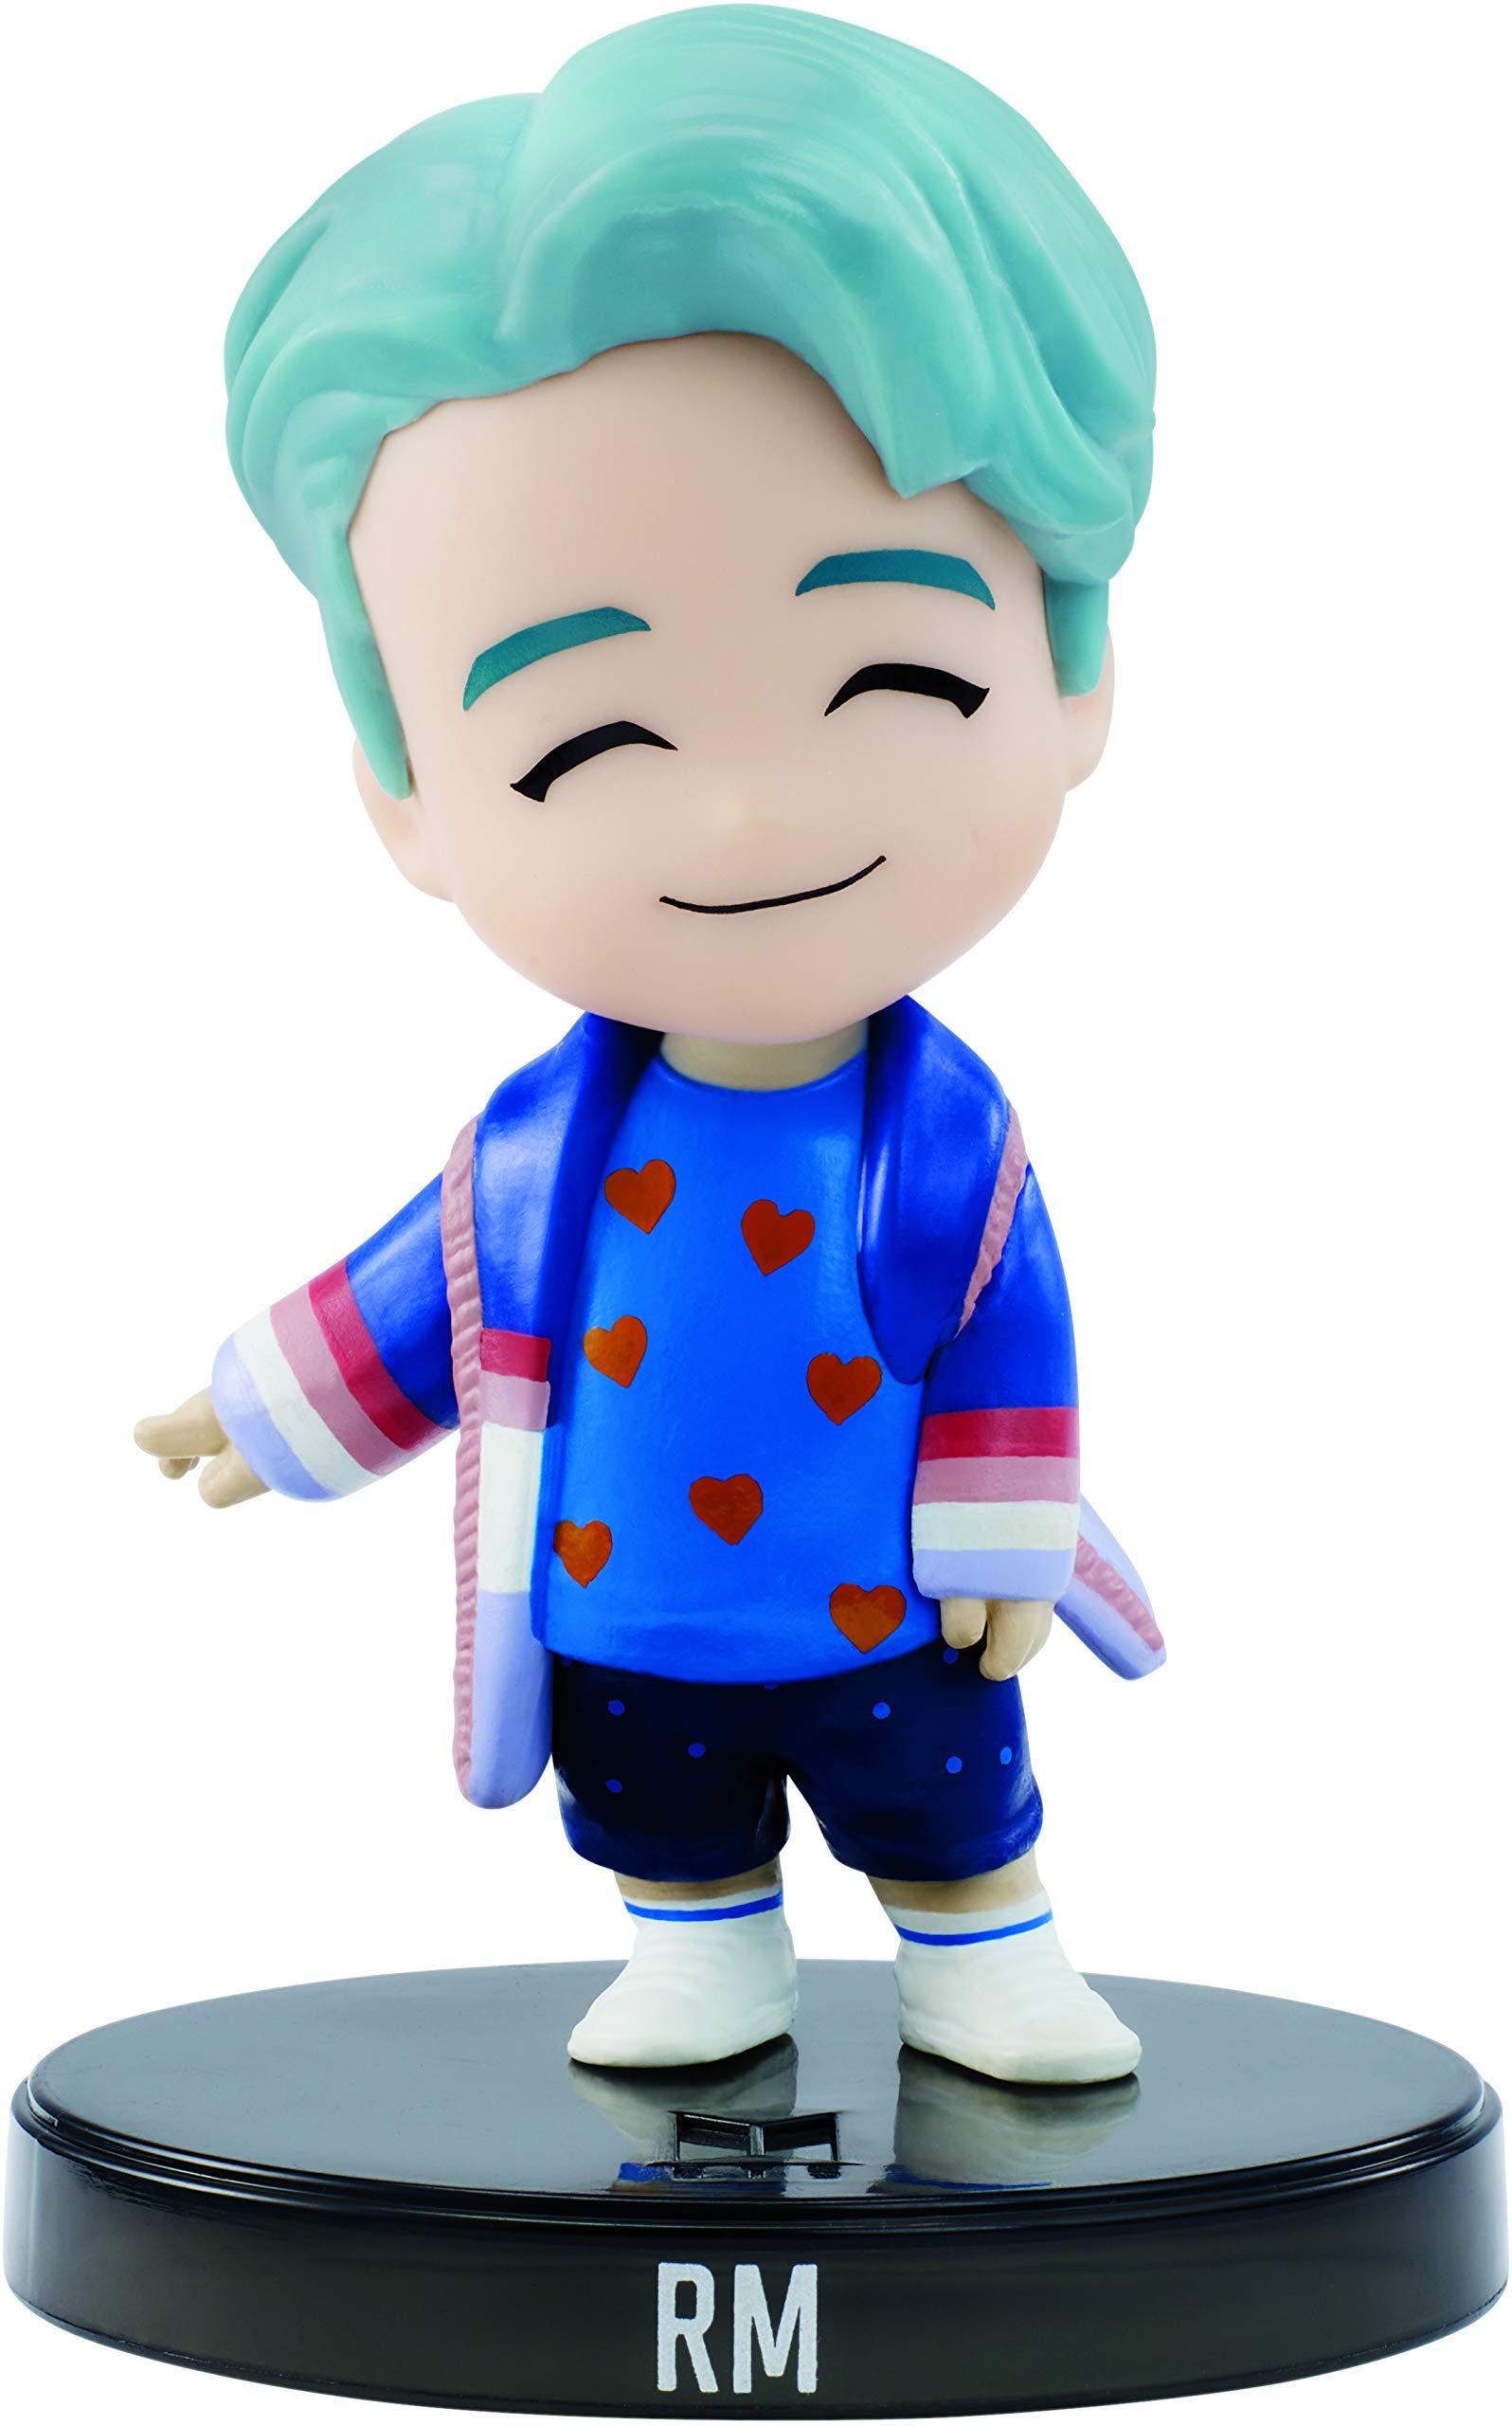 K-Pop Toys Merchandi Mattel GKC93 BTS Jimin Idol Fashion Doll for Collectors